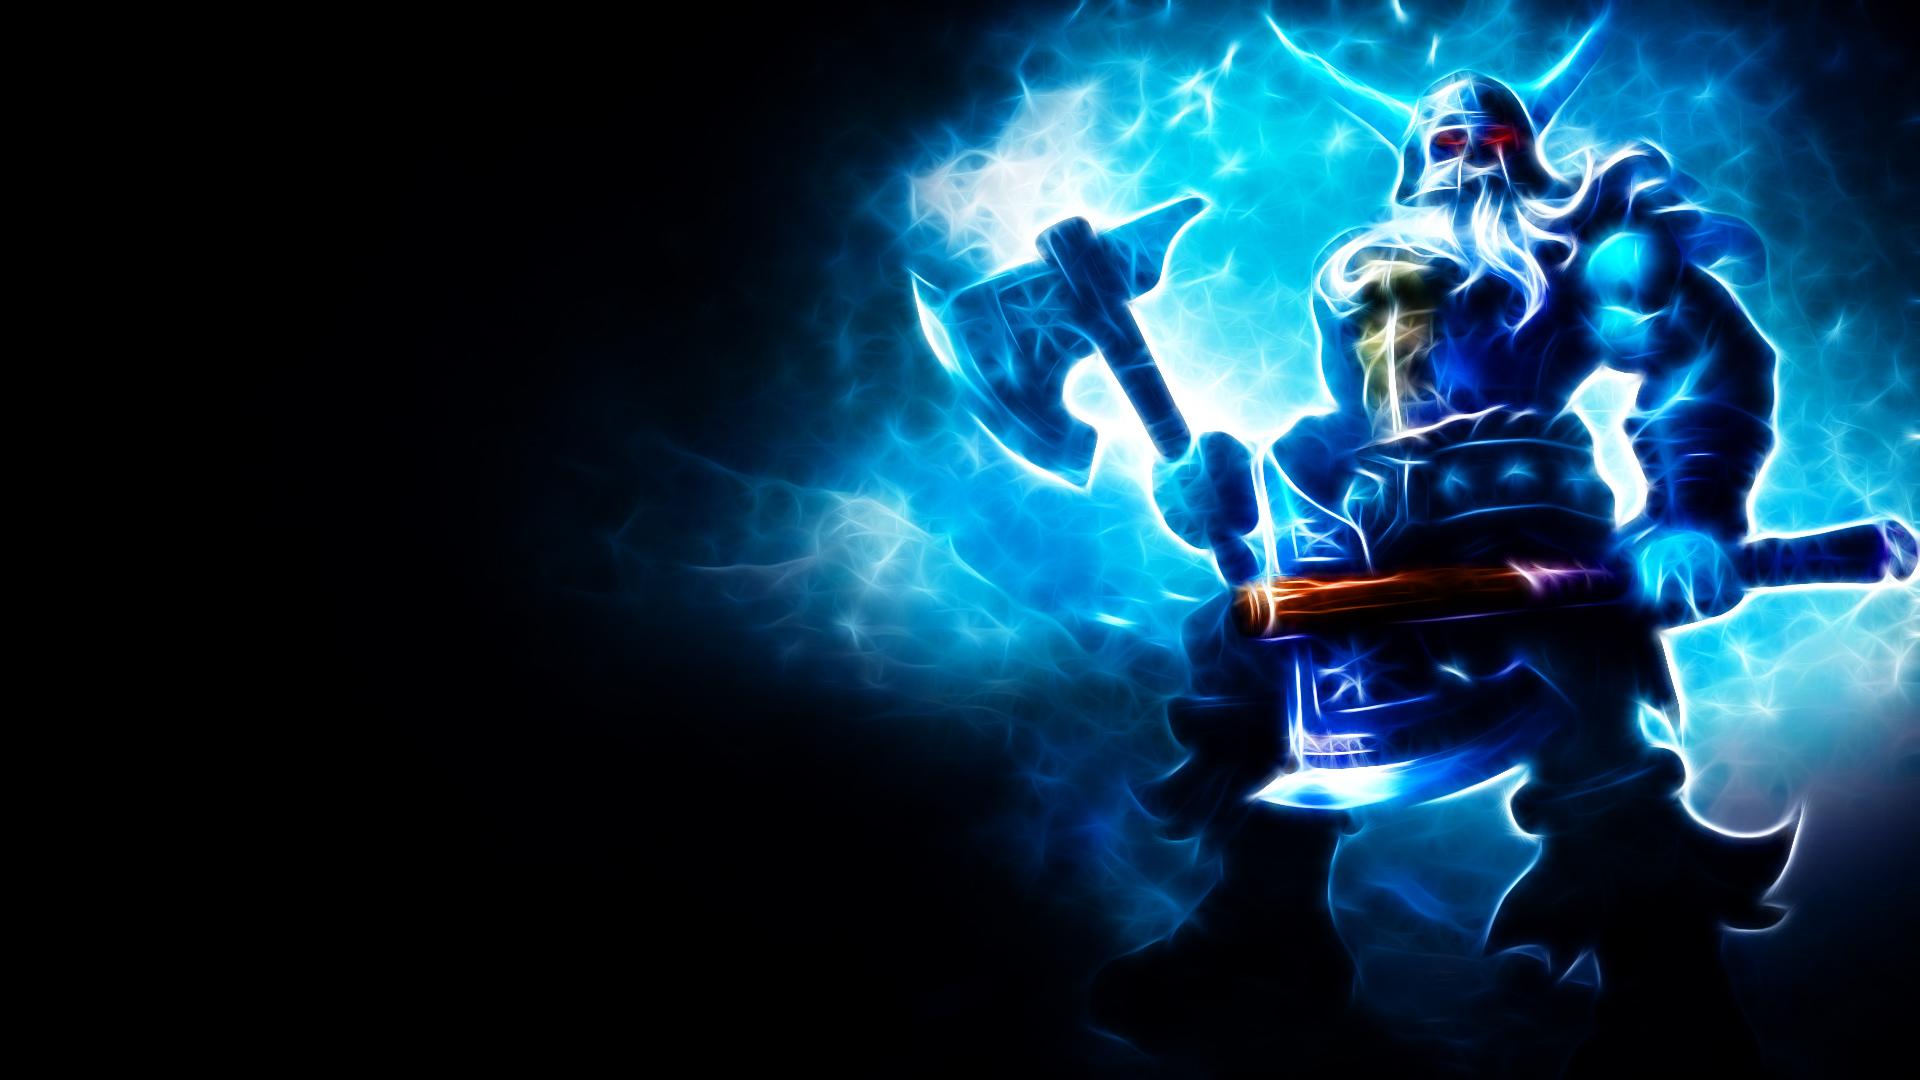 League of Legends wallpaper 33